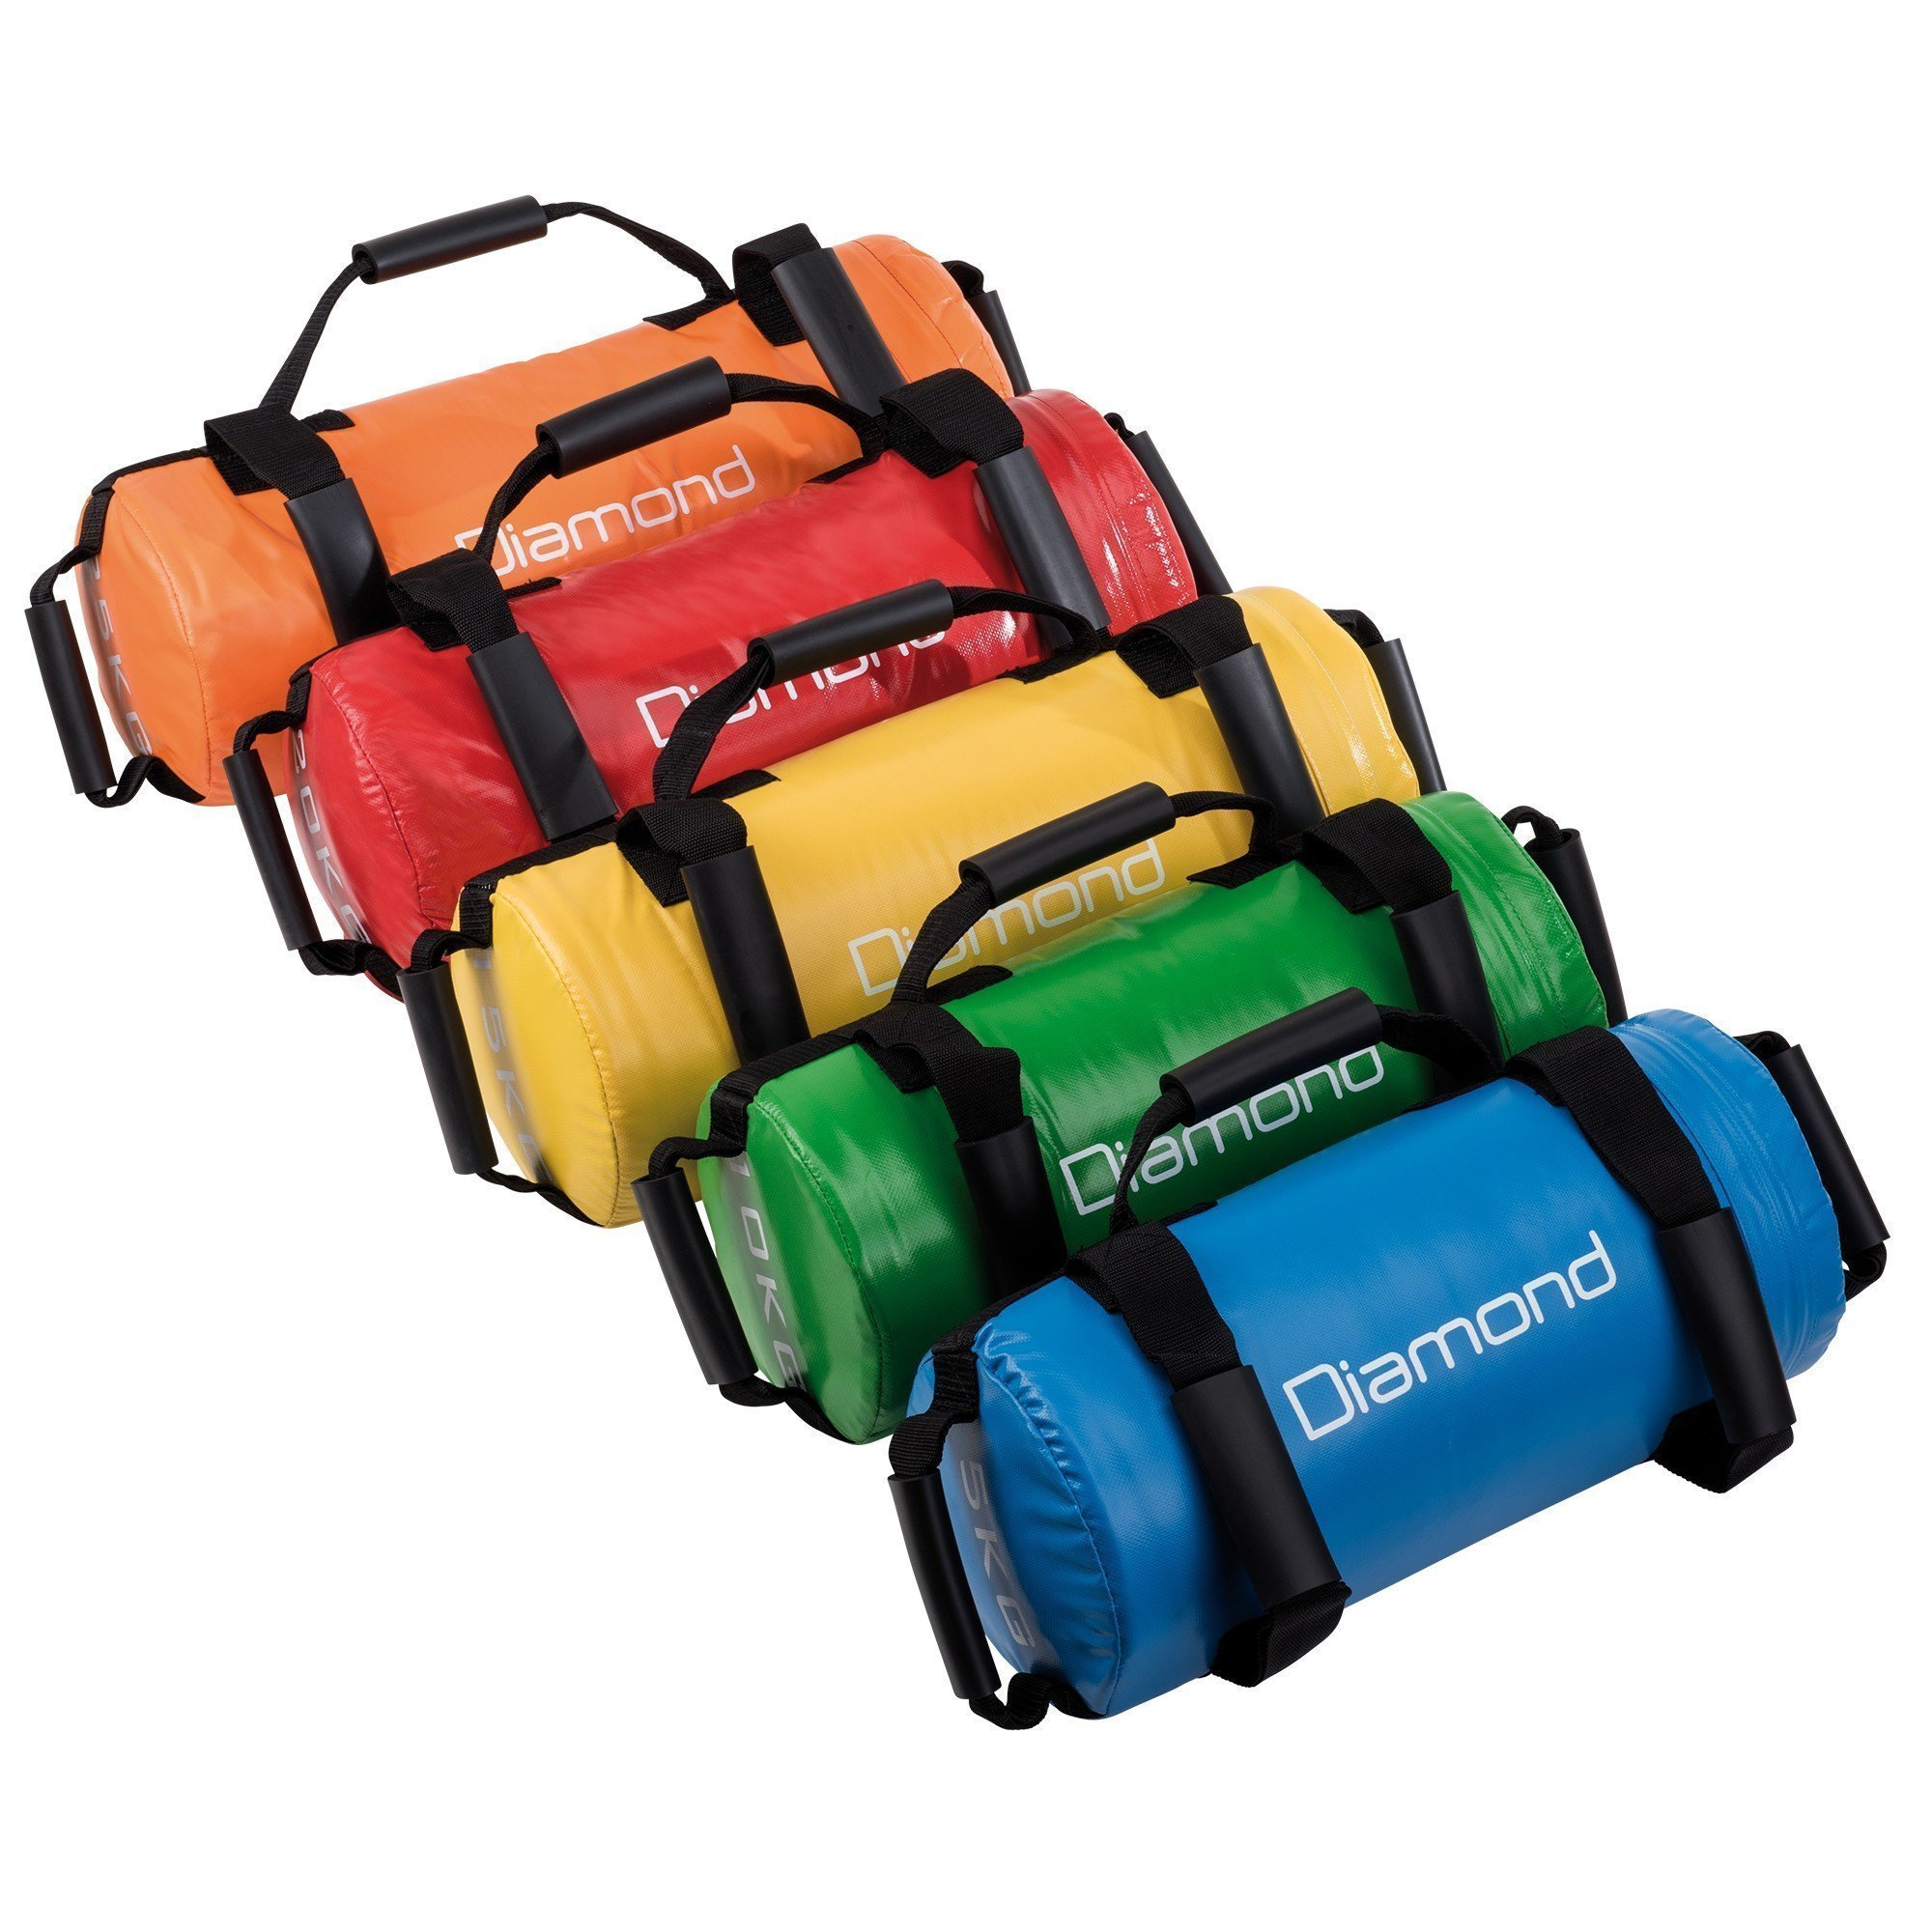 JK DIAMOND - Power bag Fitness - Force bag